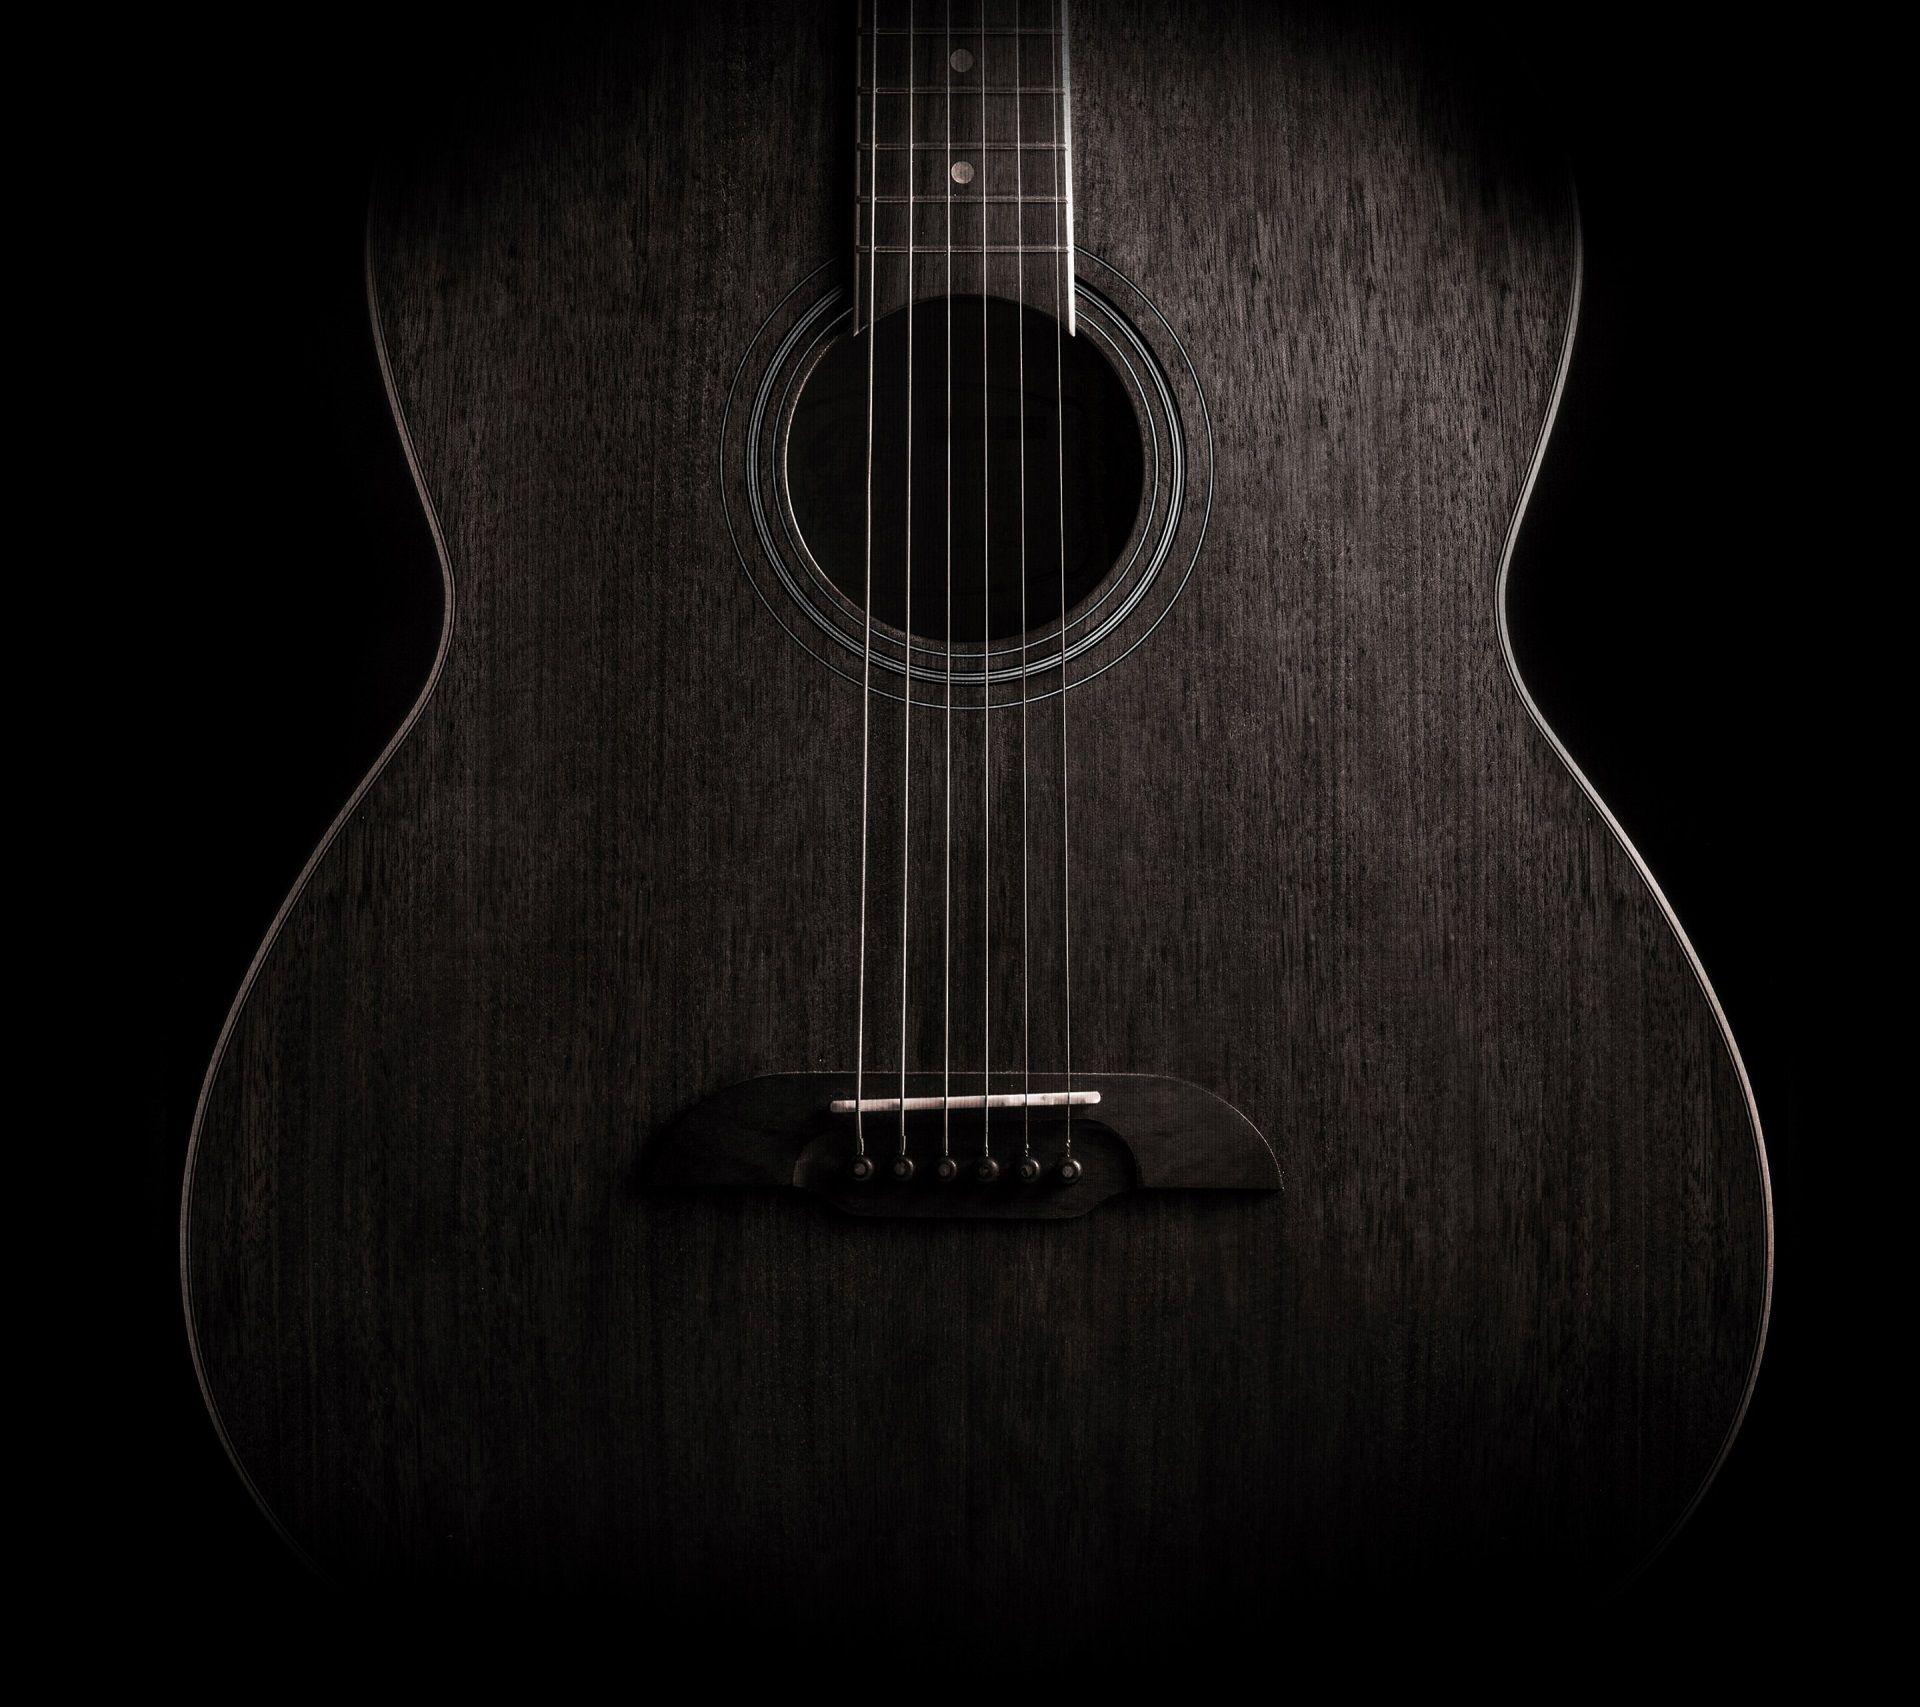 1920x1707 Guitar Full Hd Wallpapers New Huawei Wallpapers Full Hd Wallpaper Cool Wallpapers For Phones